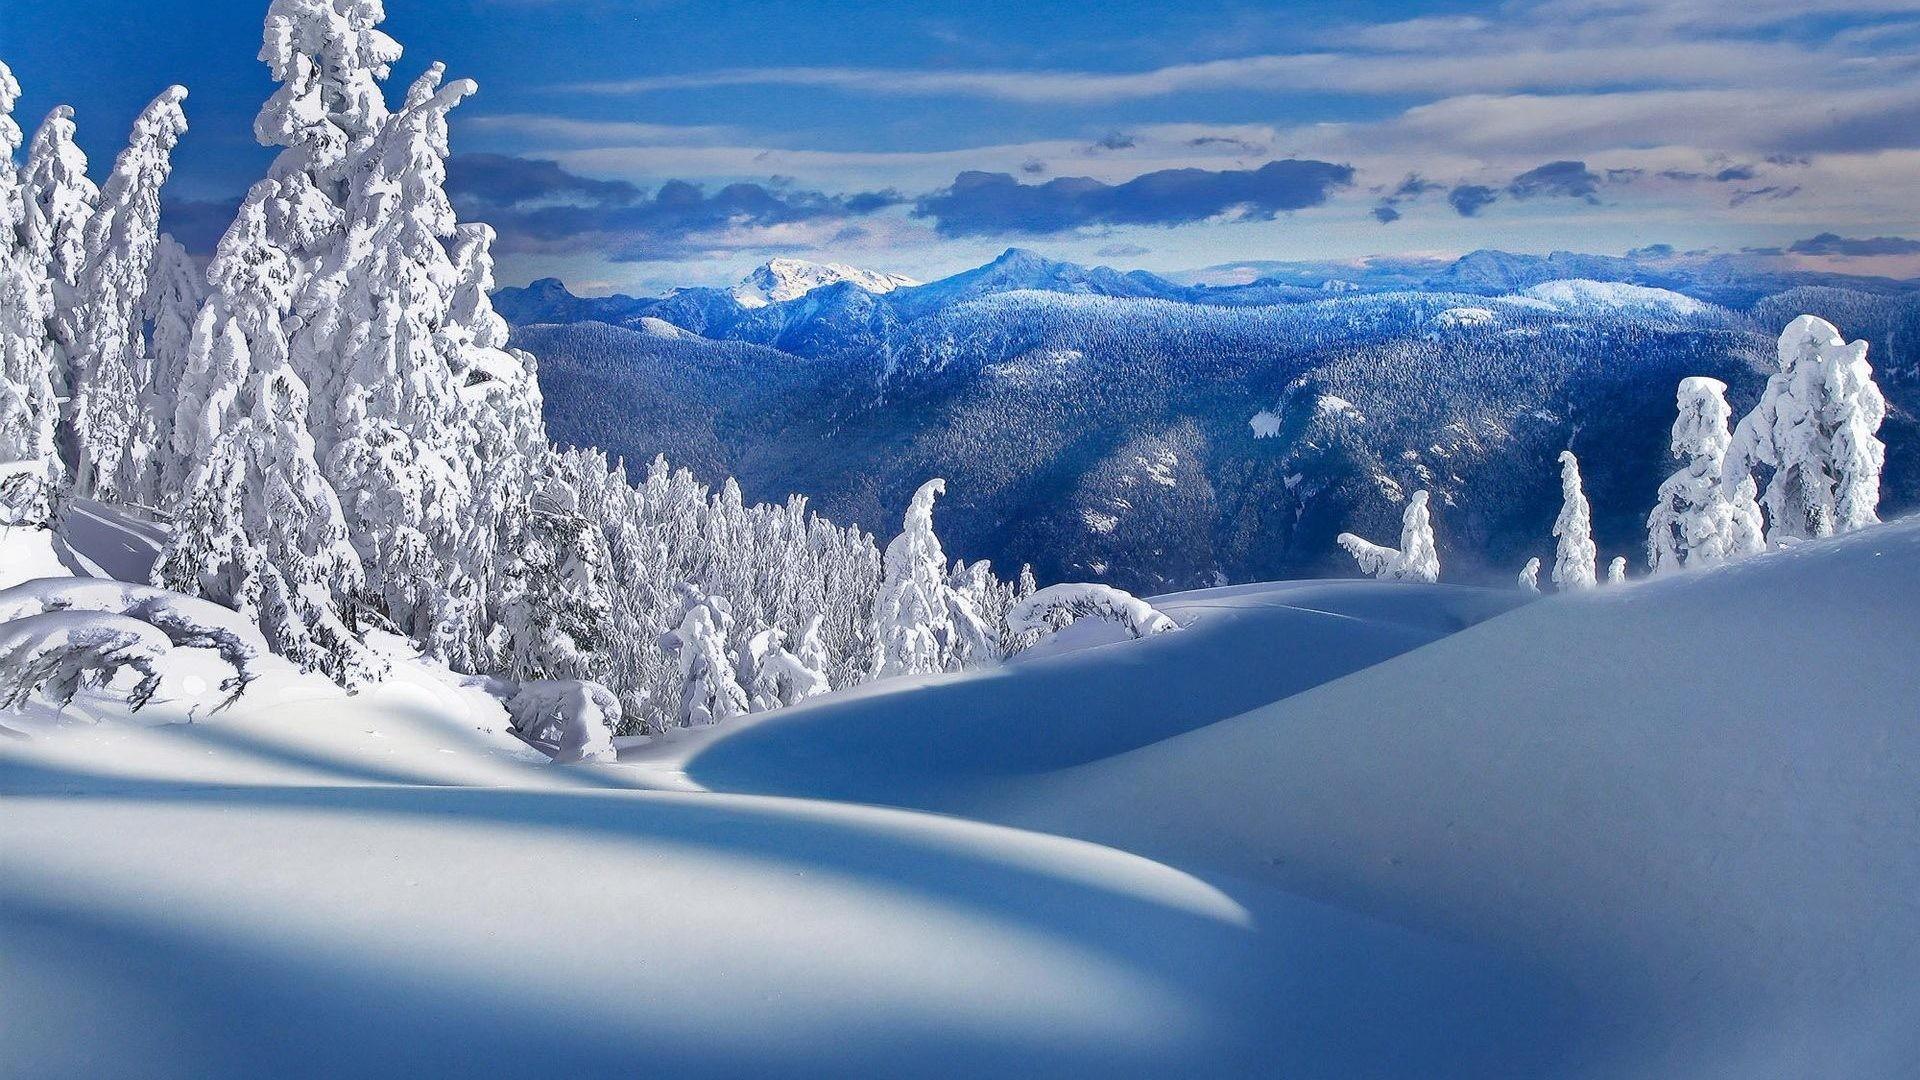 winter nature wallpaper (74+ images)